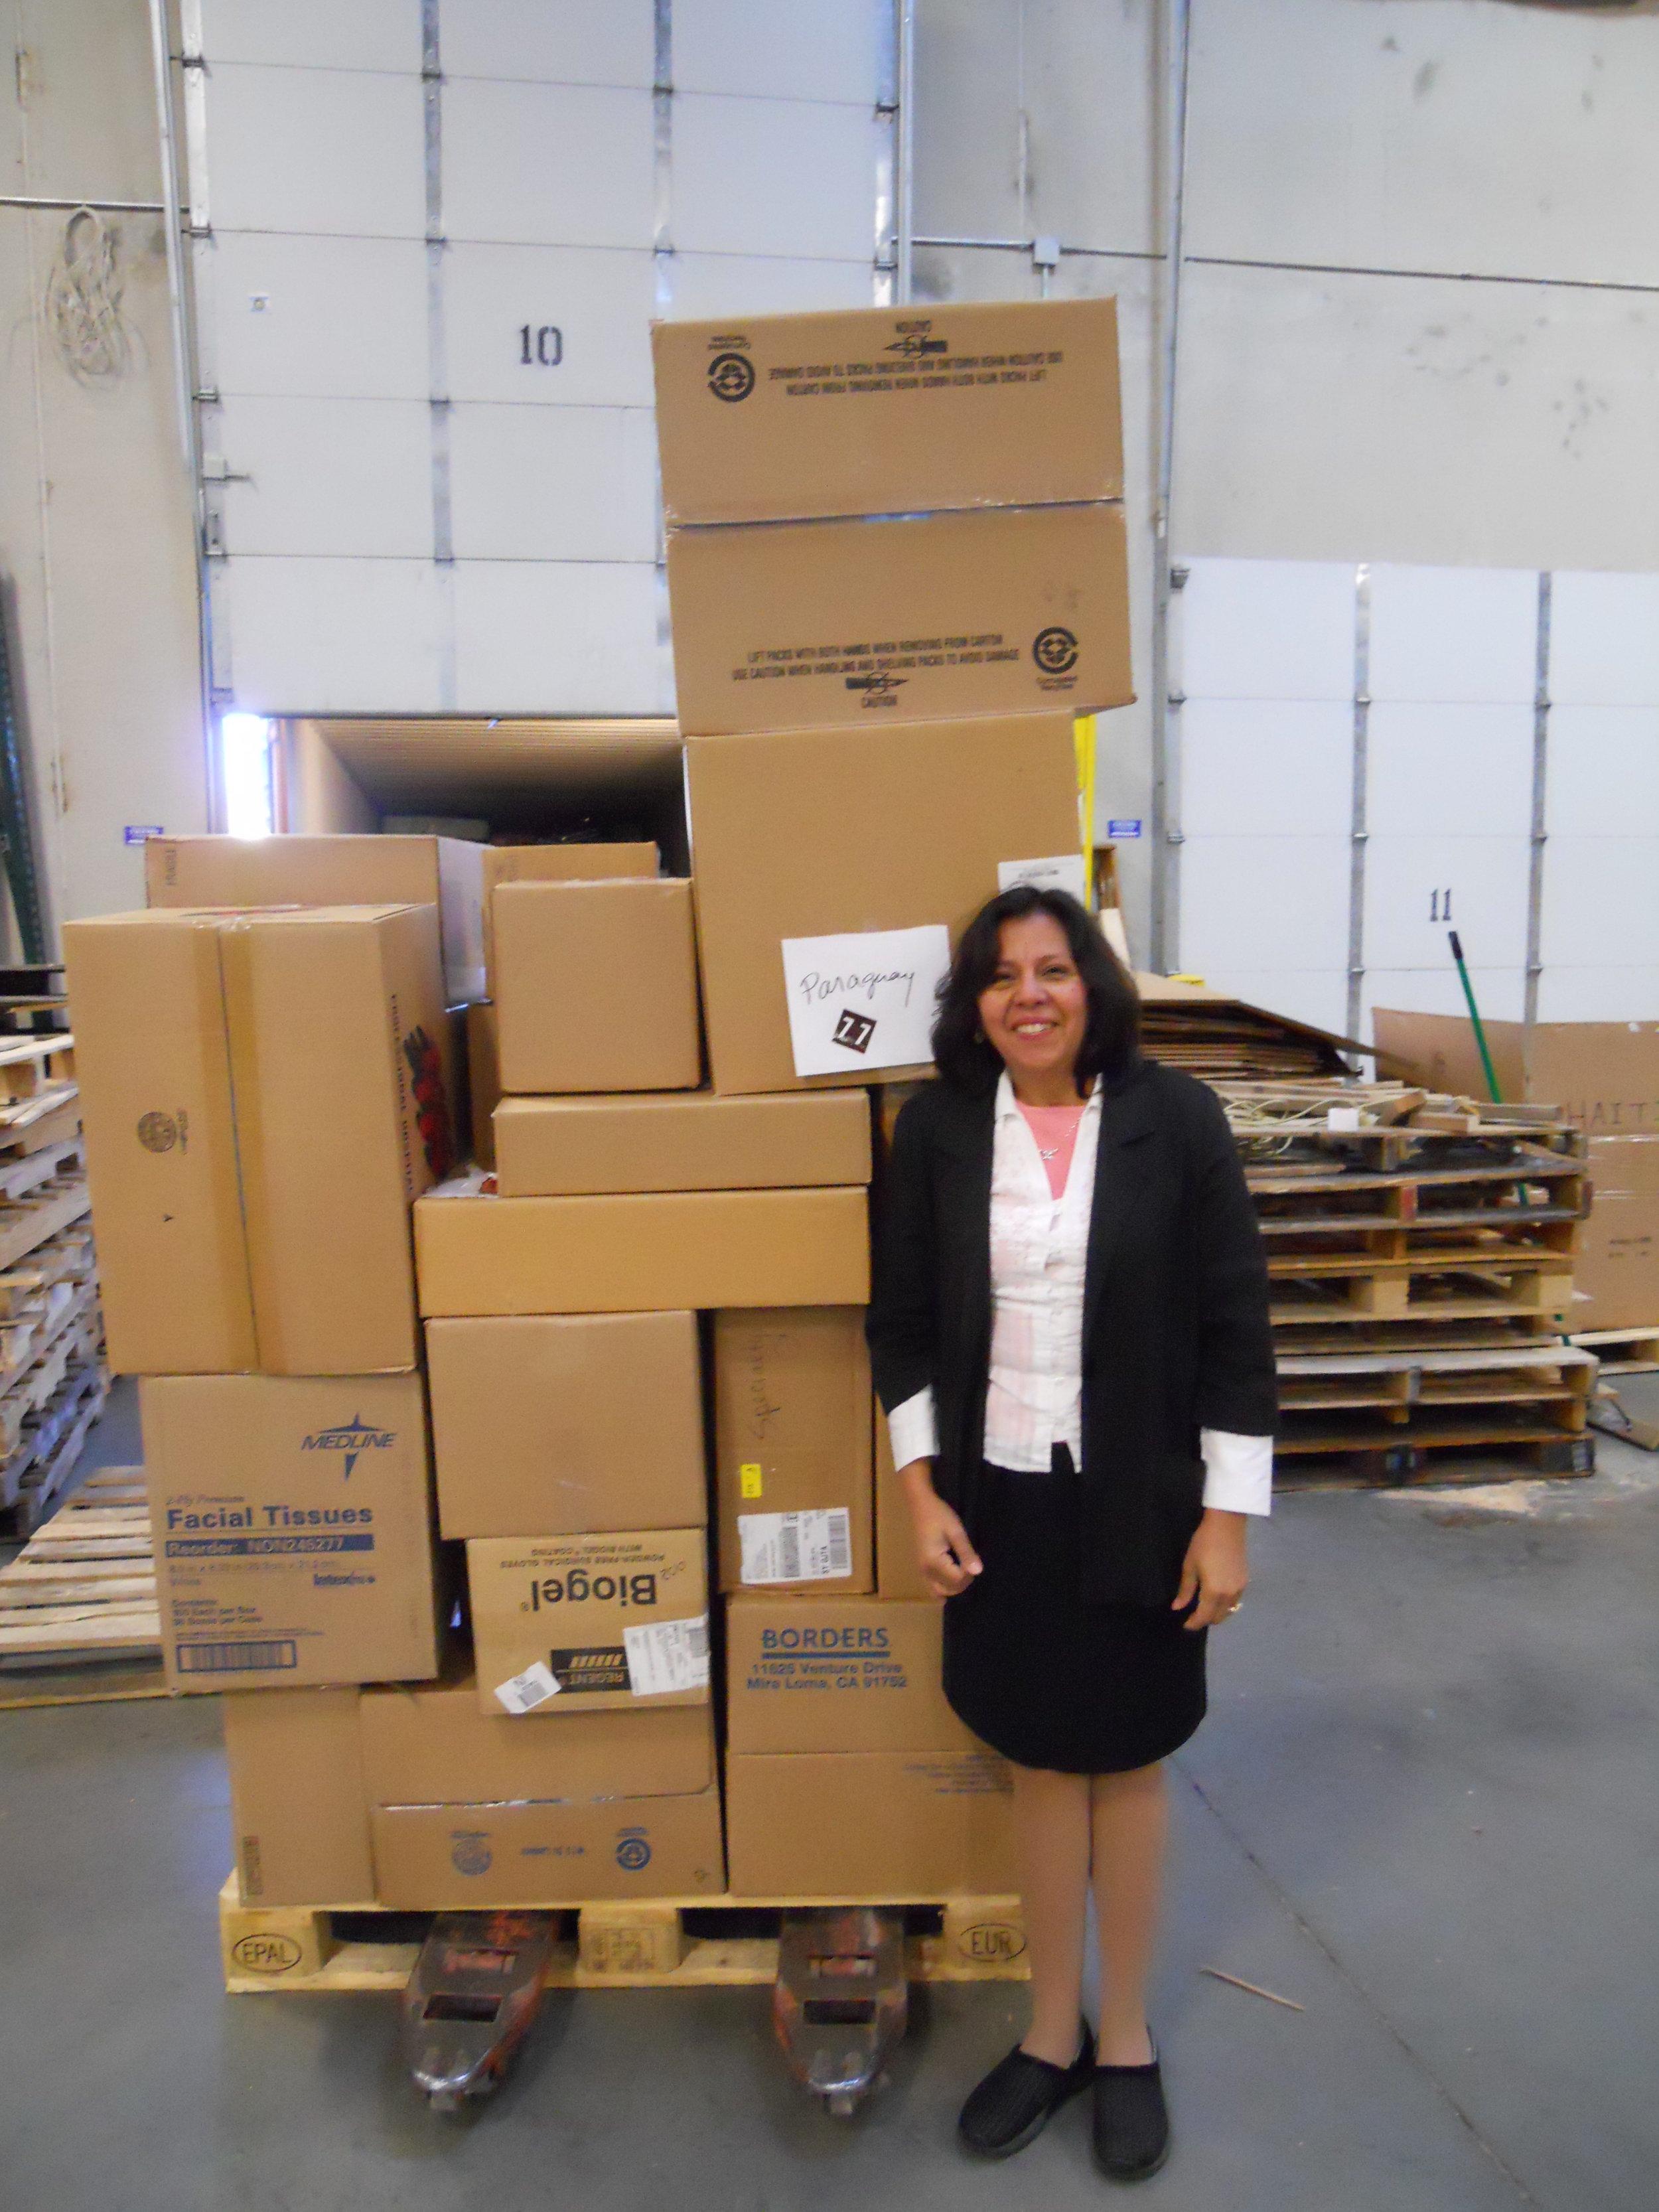 Felisa helps with loading supplies